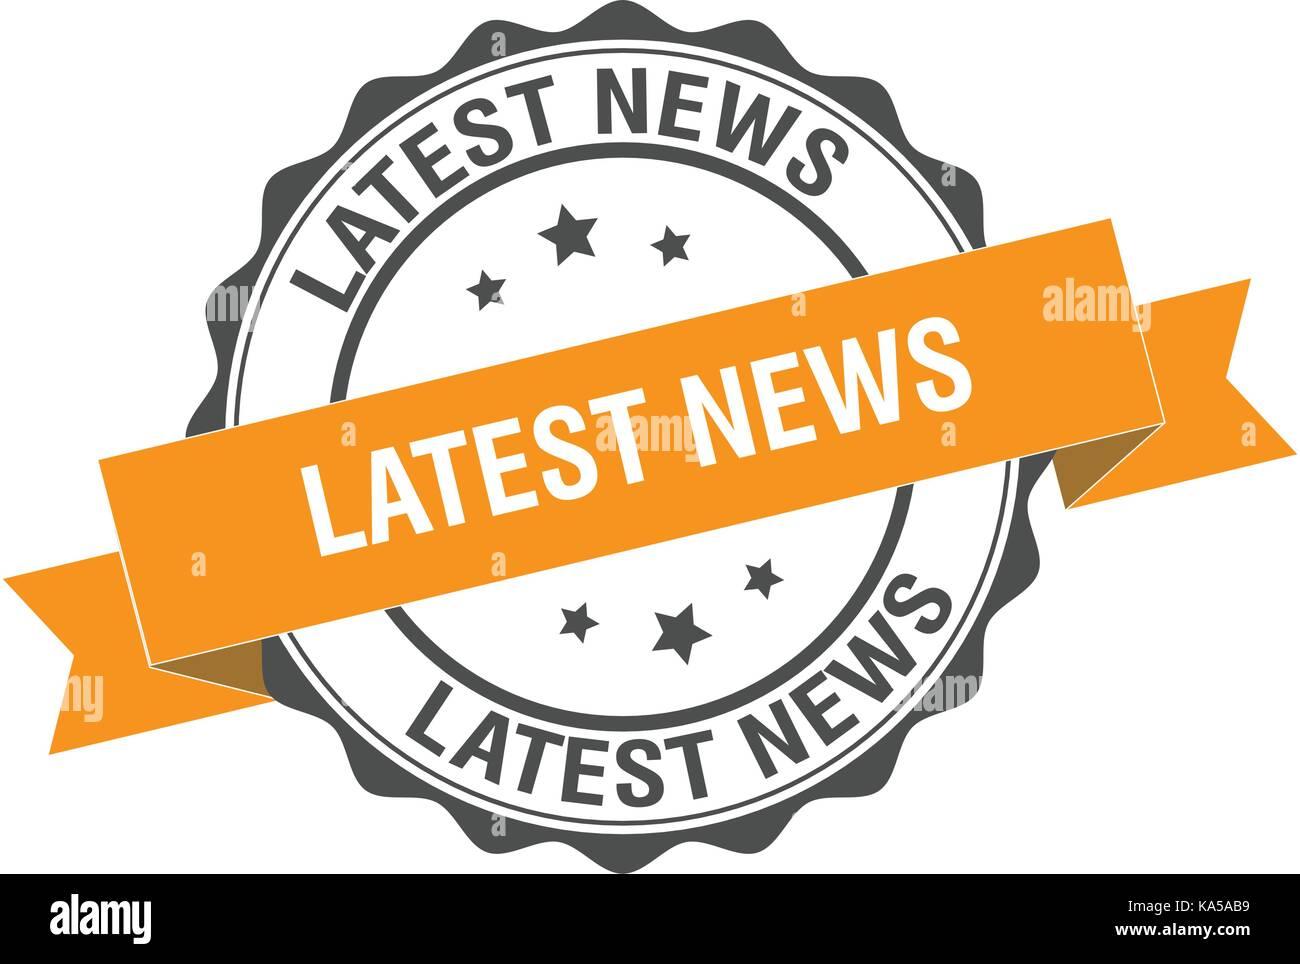 Latest news stamp illustration - Stock Image